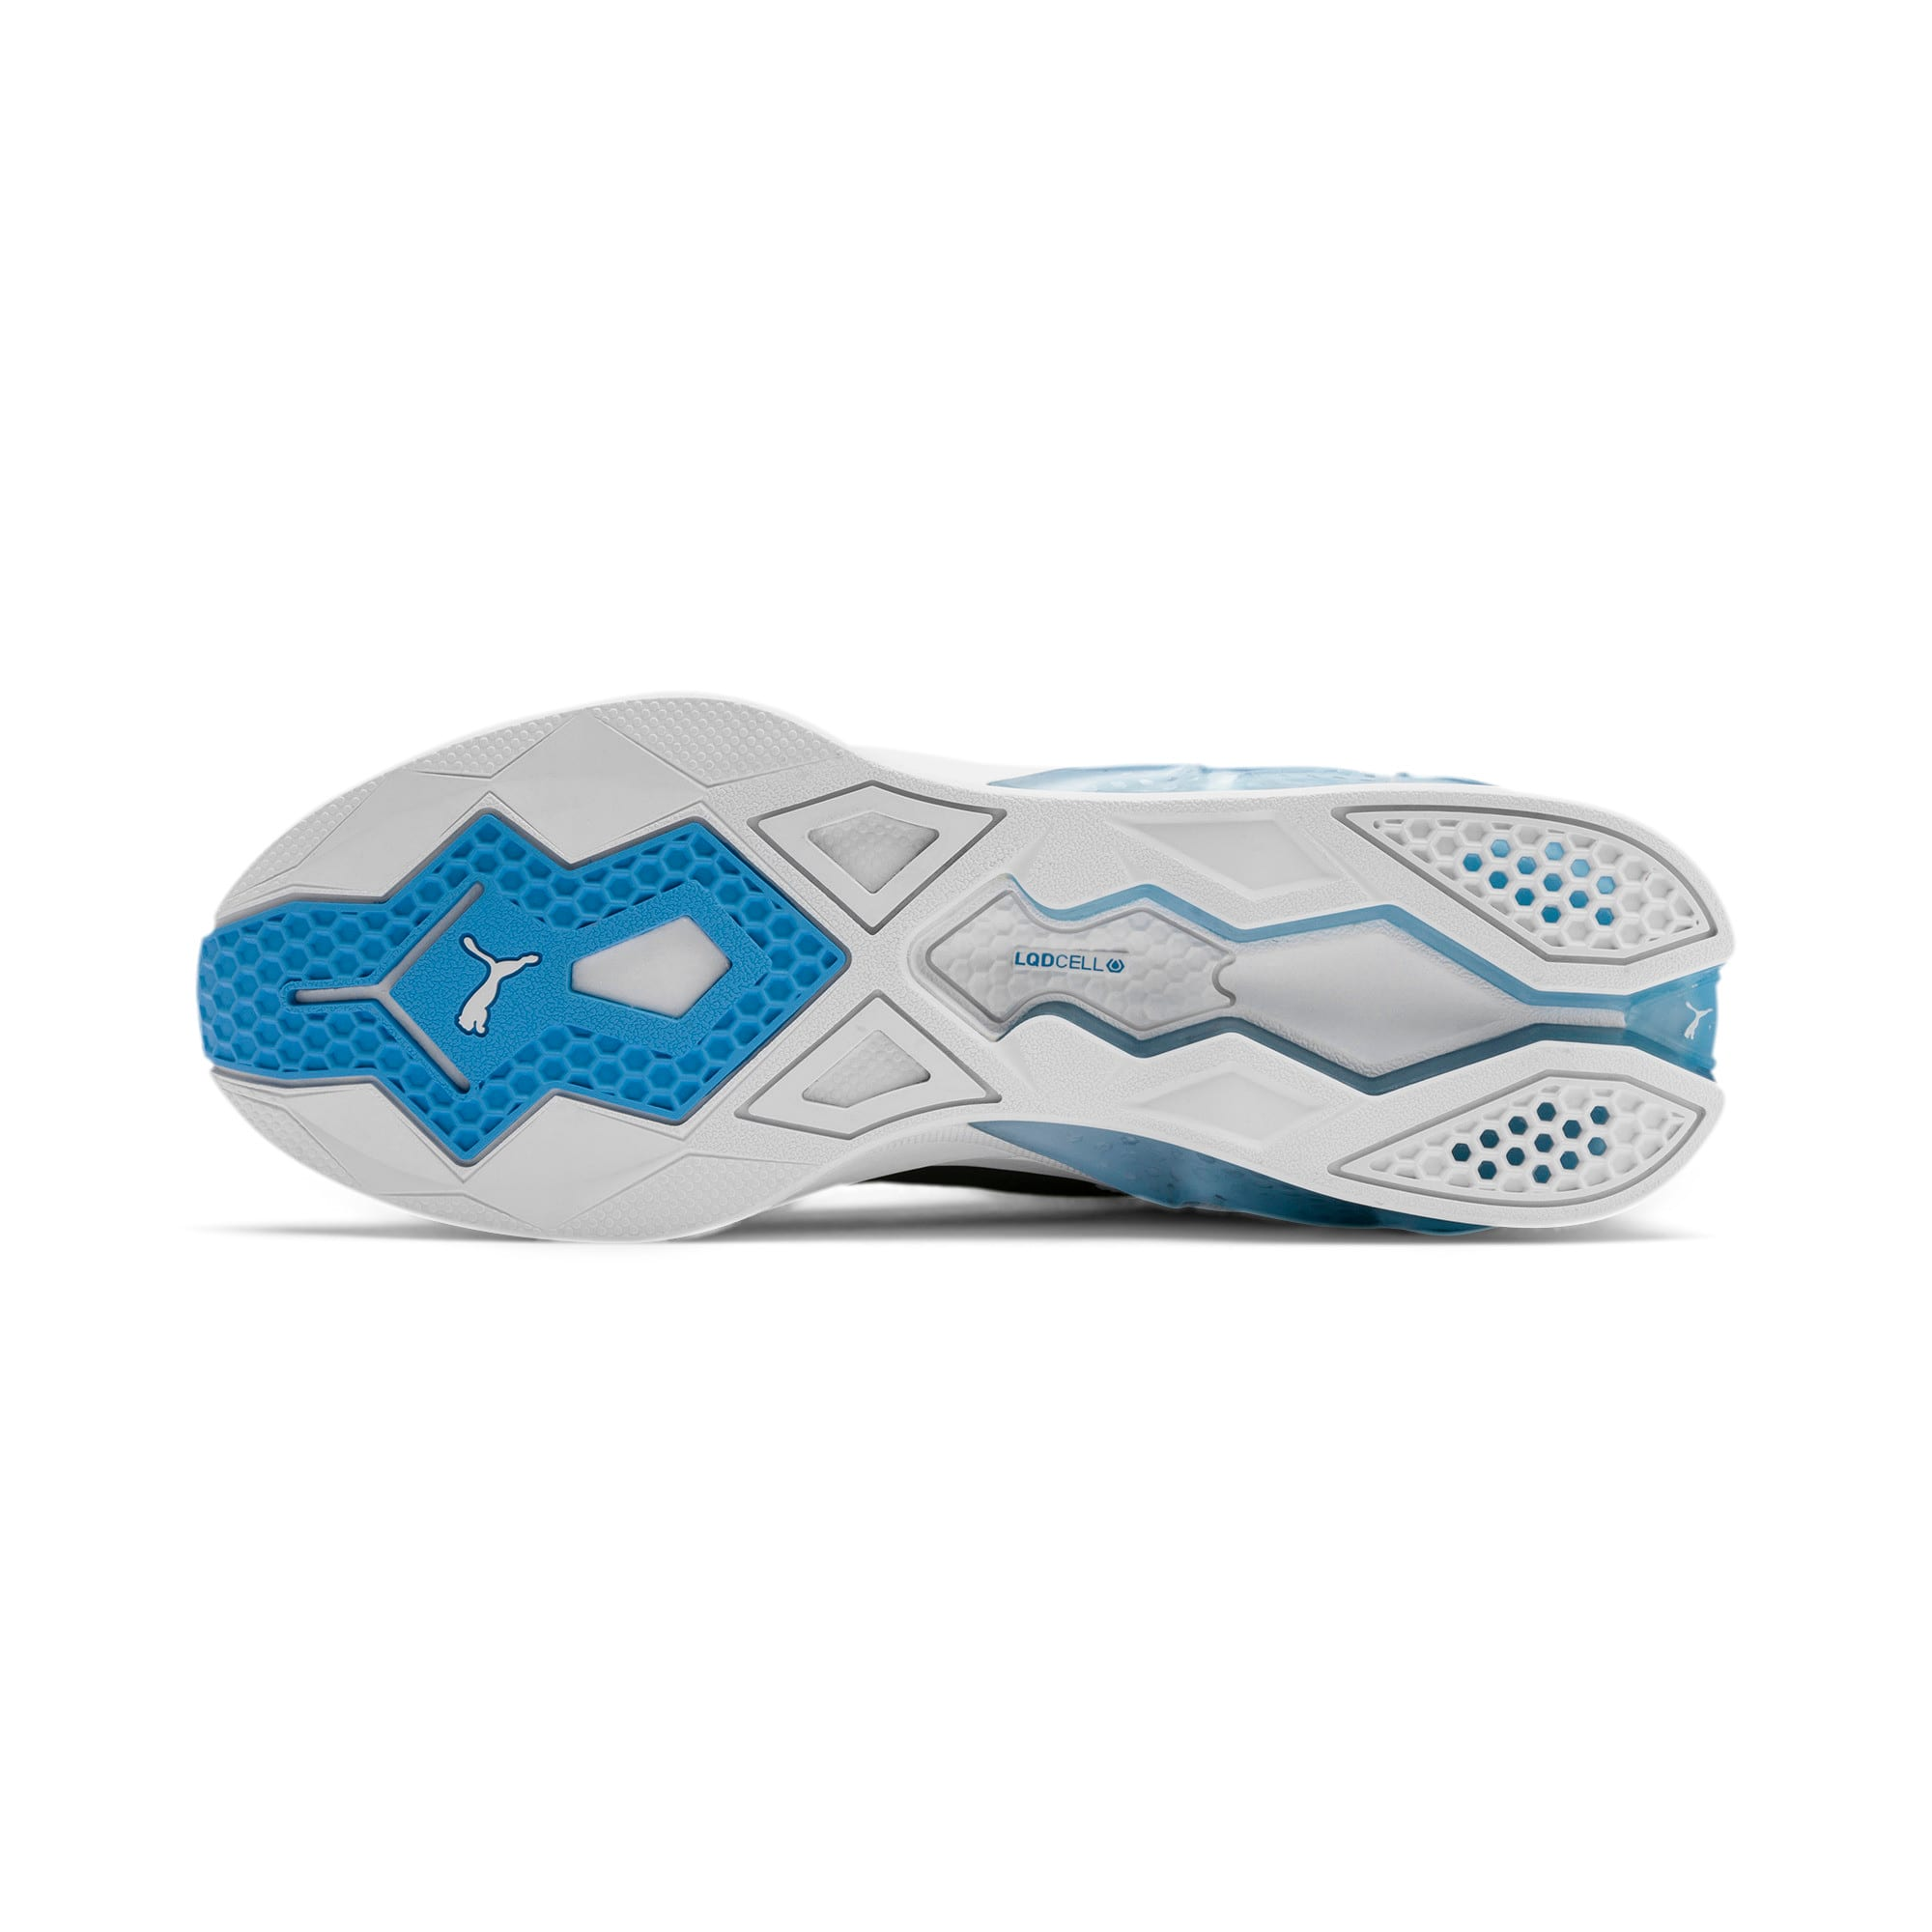 Anteprima 5 di LQDCELL Origin Men's Shoes, Puma White-Puma Black, medio